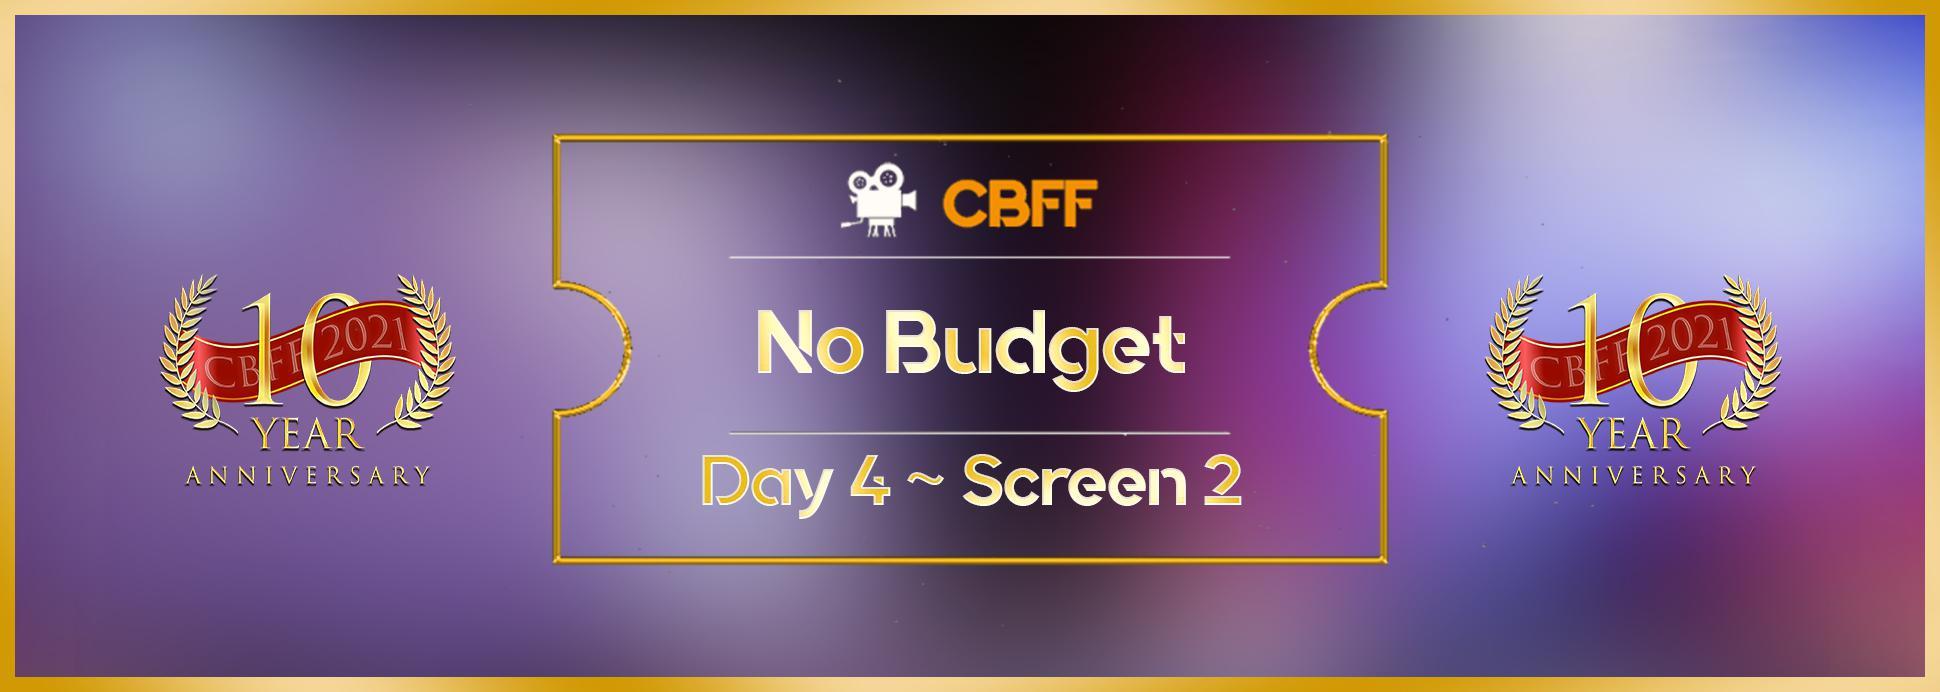 Day 4, Screen 2: No Budget